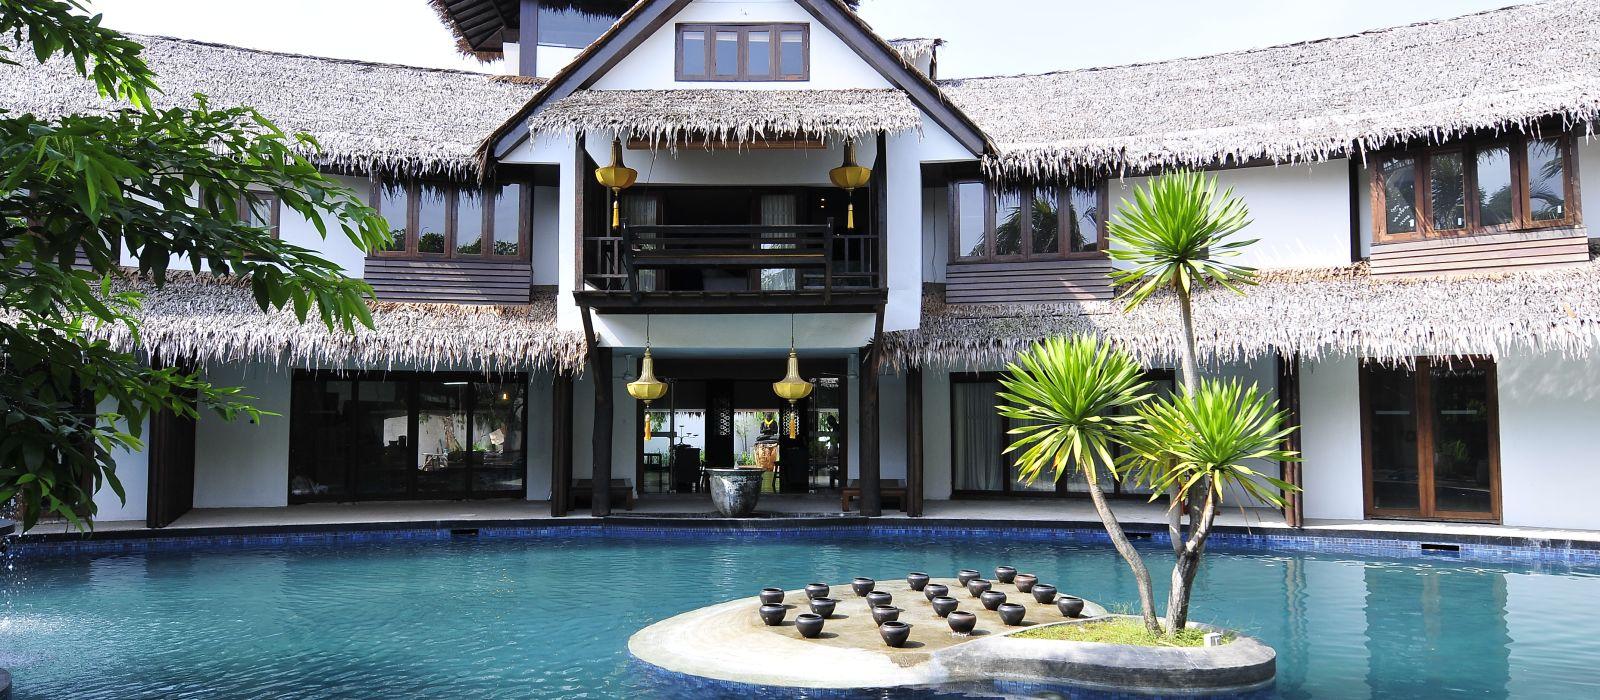 Höhepunkte der Halbinsel Malaysia Urlaub 4